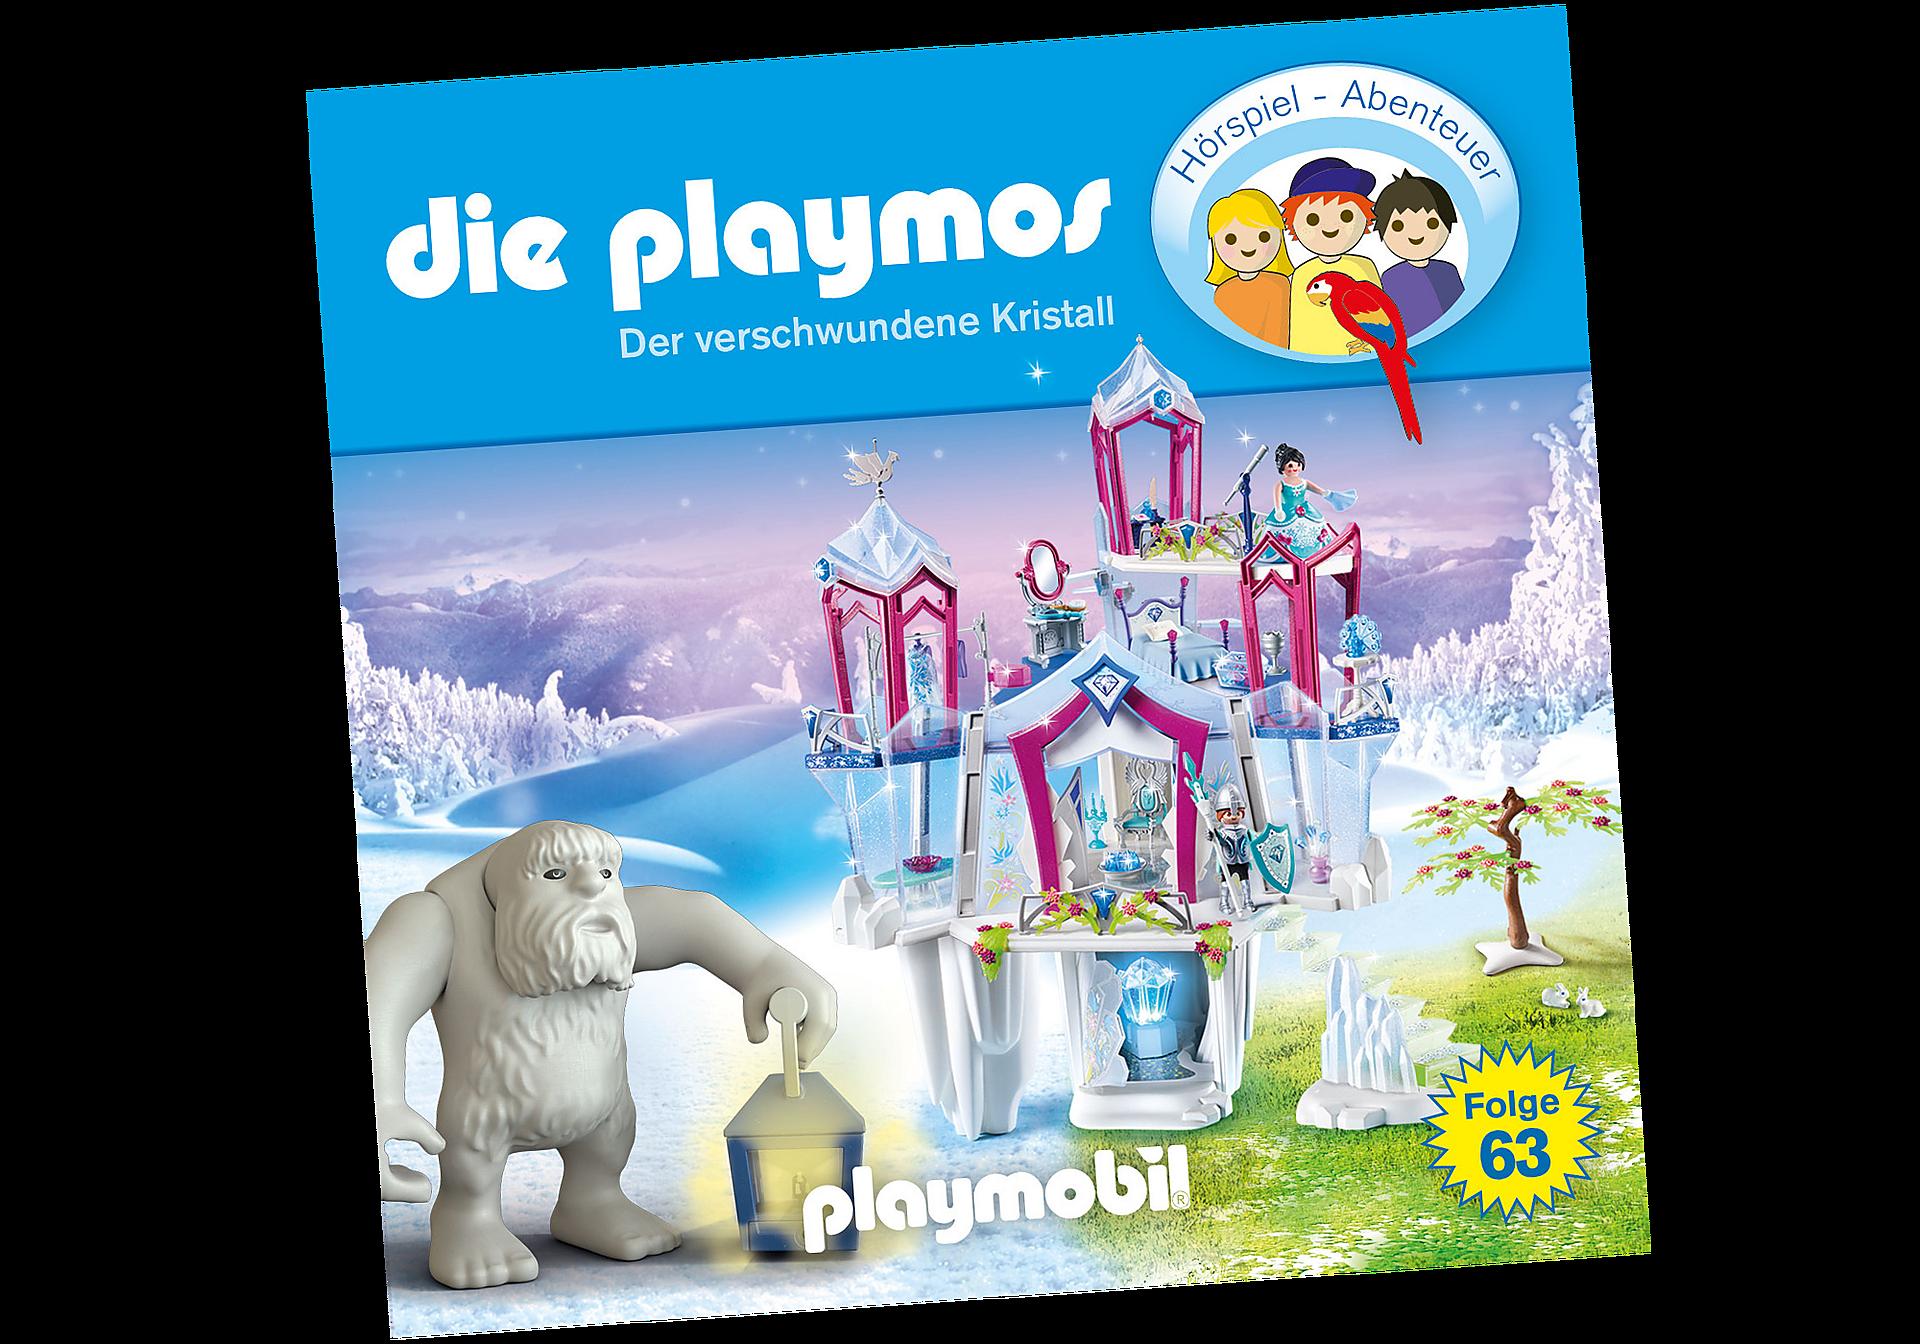 http://media.playmobil.com/i/playmobil/80085_product_detail/Der verschwundene Kristall - Folge 63